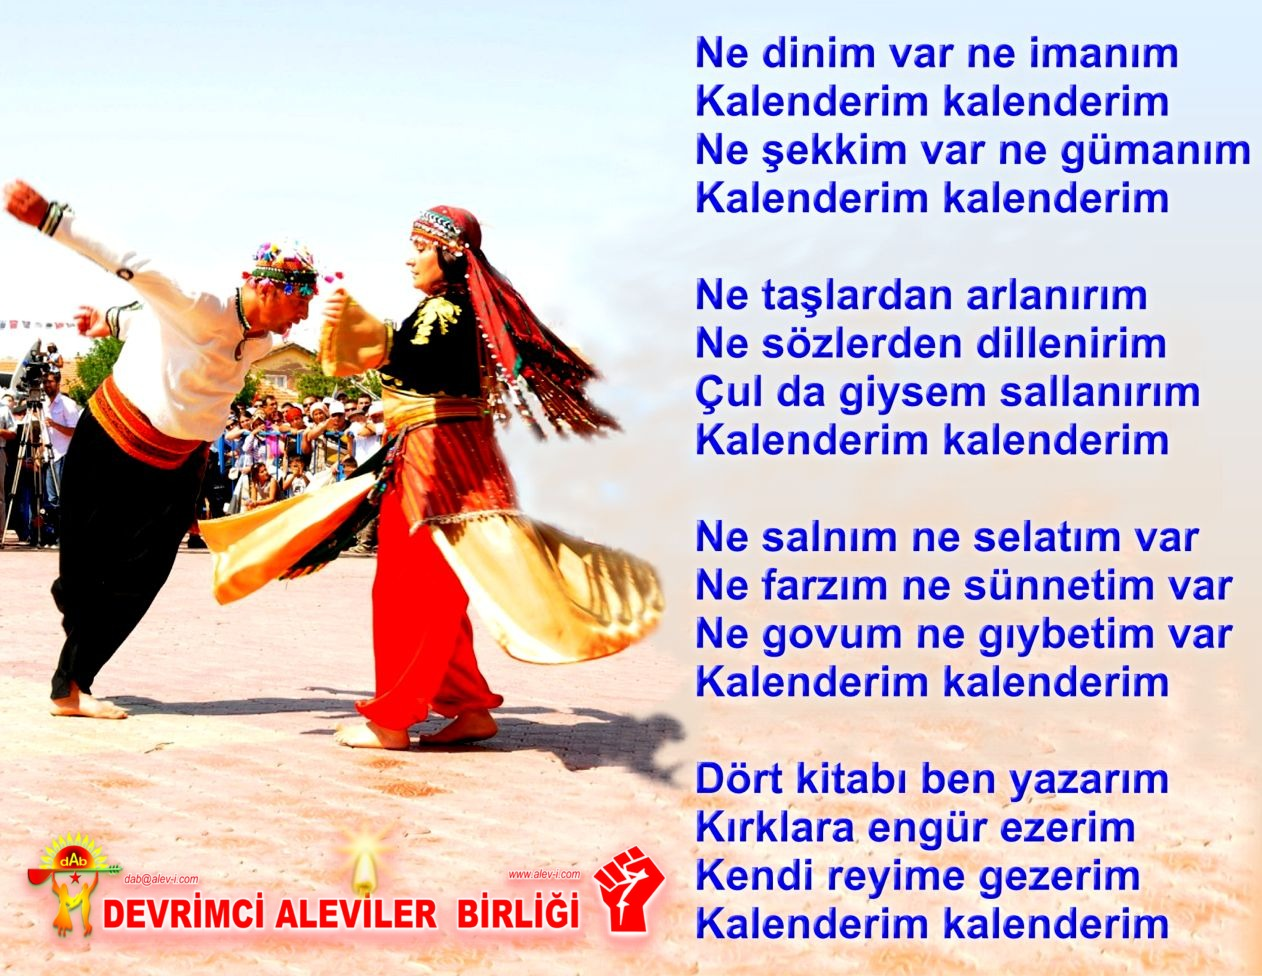 Alevi Bektaşi Kızılbaş Pir Sultan Devrimci Aleviler Birliği DAB post çul kalander